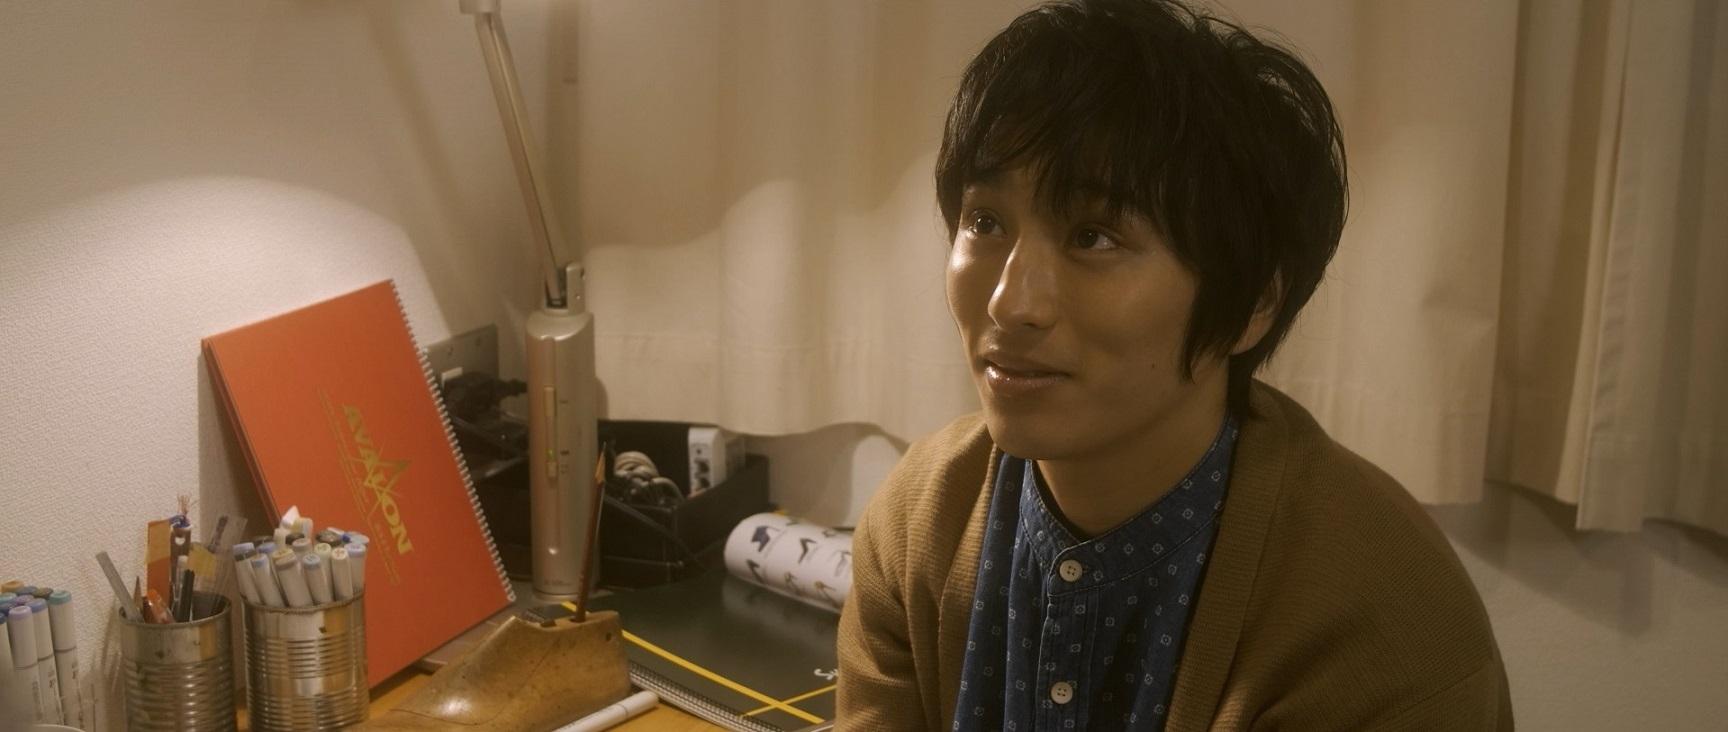 (C)2020 Japanese Musical Cinema/Human Design Inc./THE DIRECTORS ALLIANCE Inc.